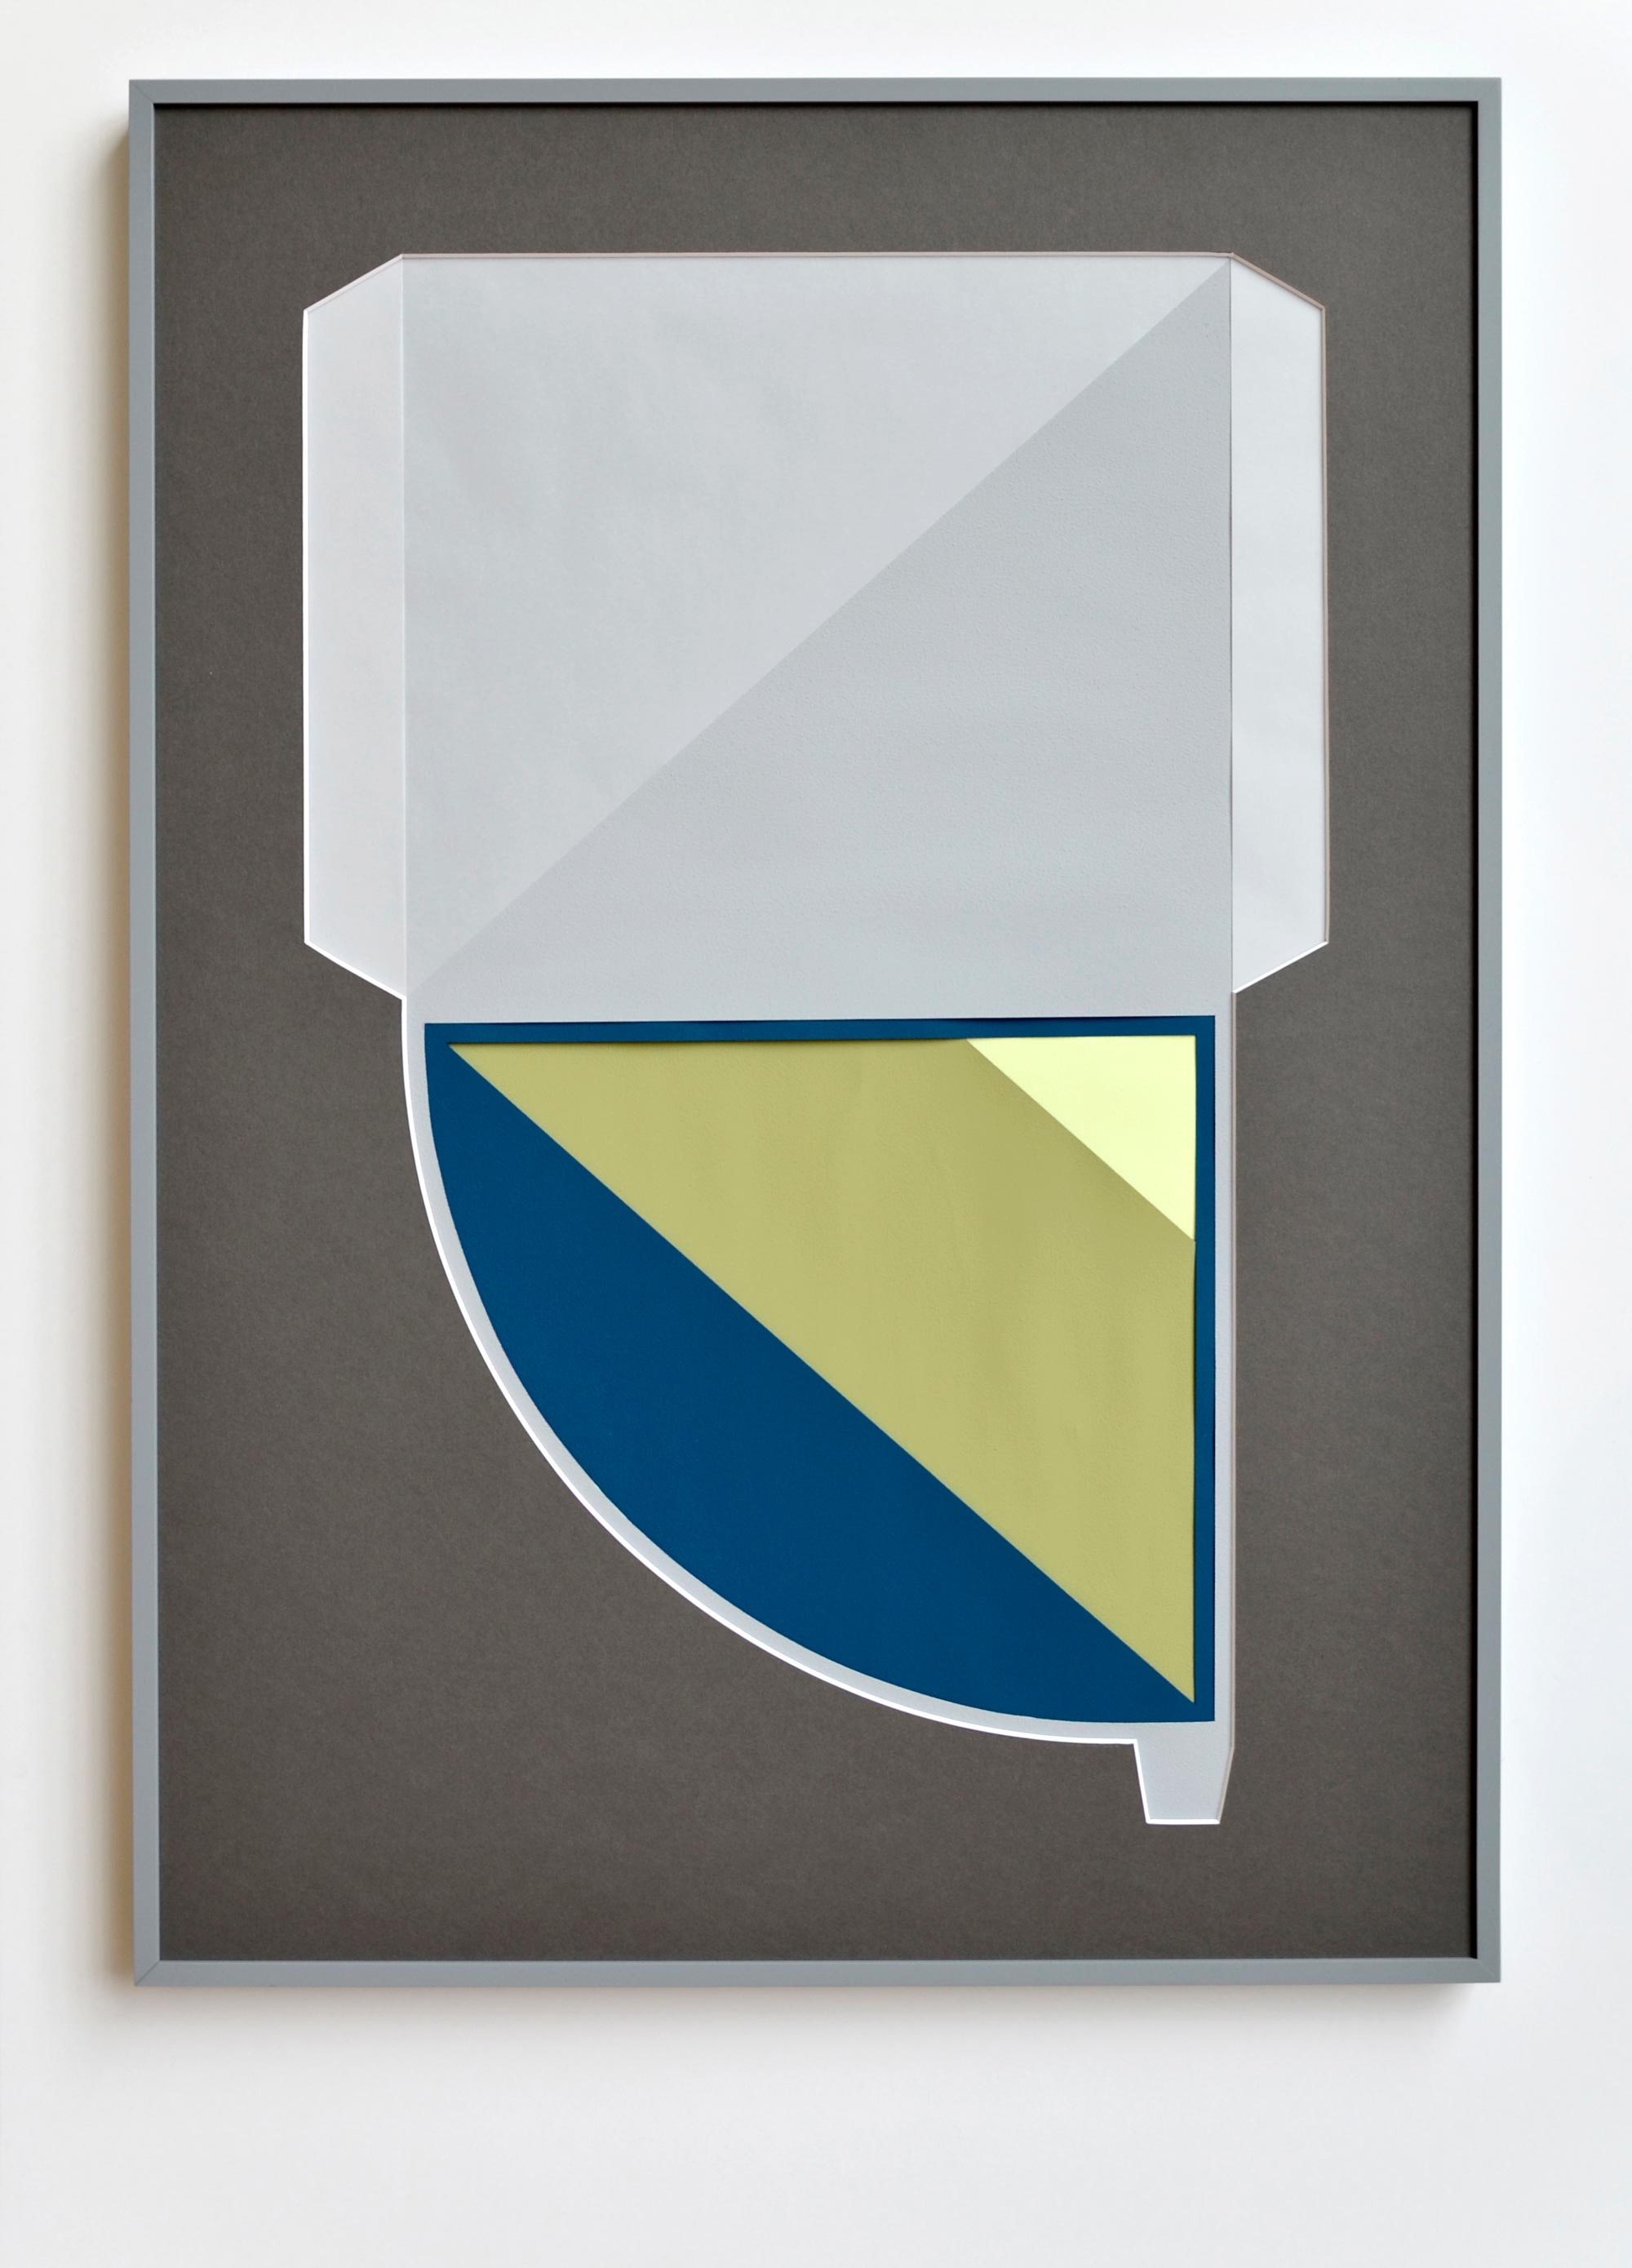 Florina Leinß: Imaginary Folding